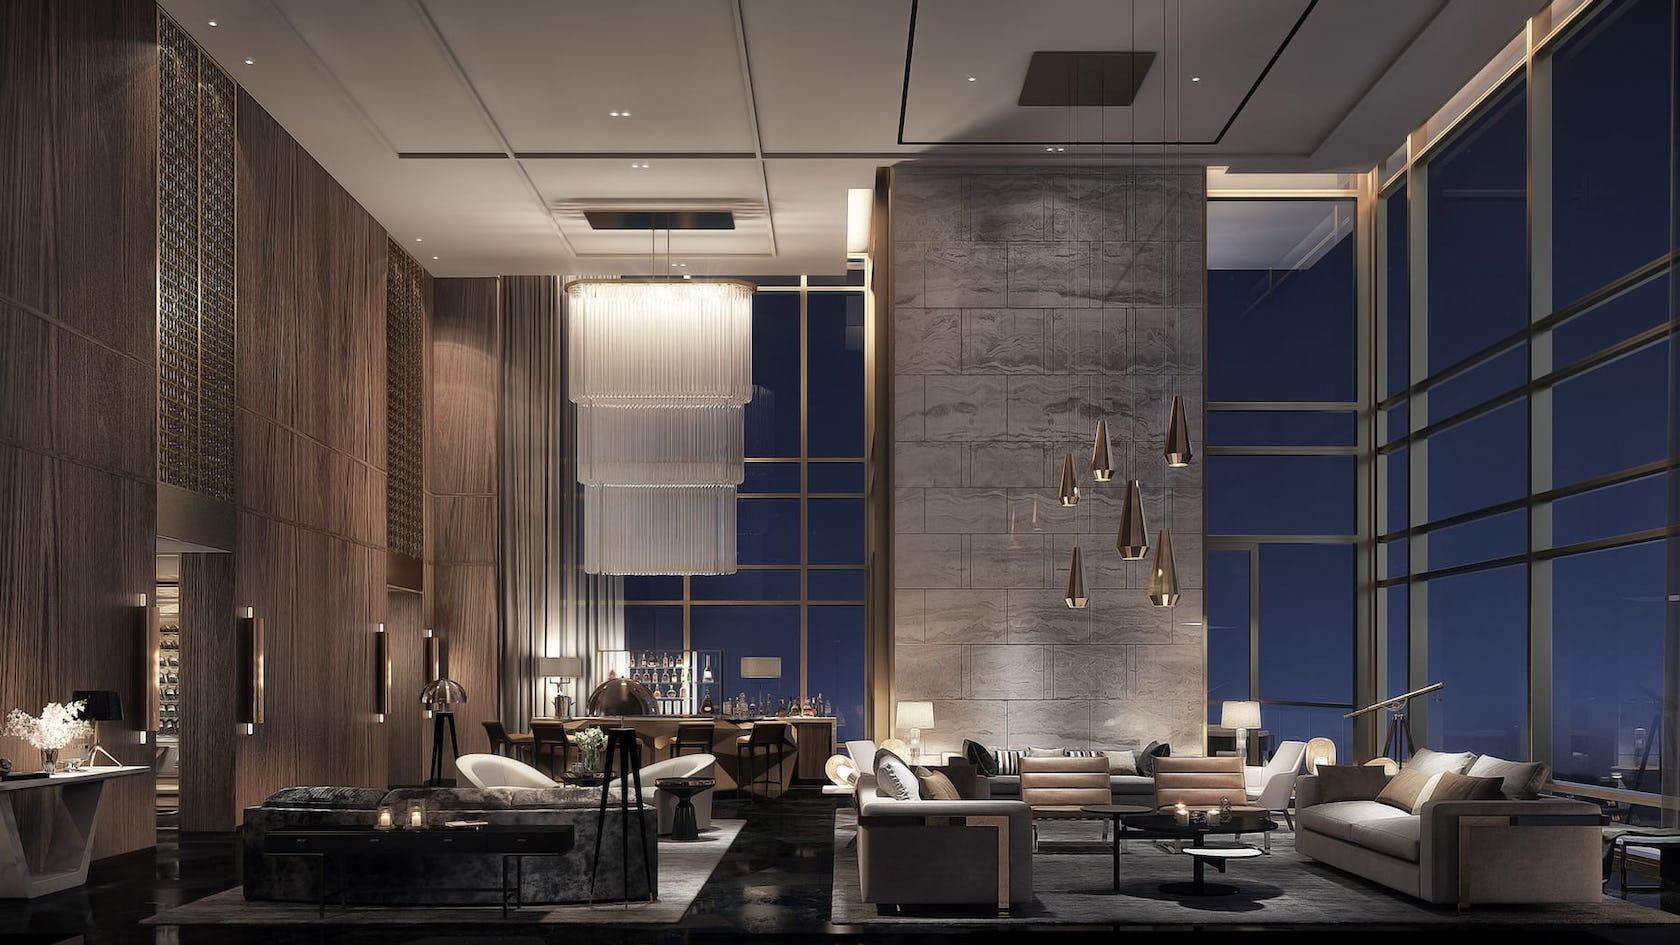 interior design indoors lobby room restaurant